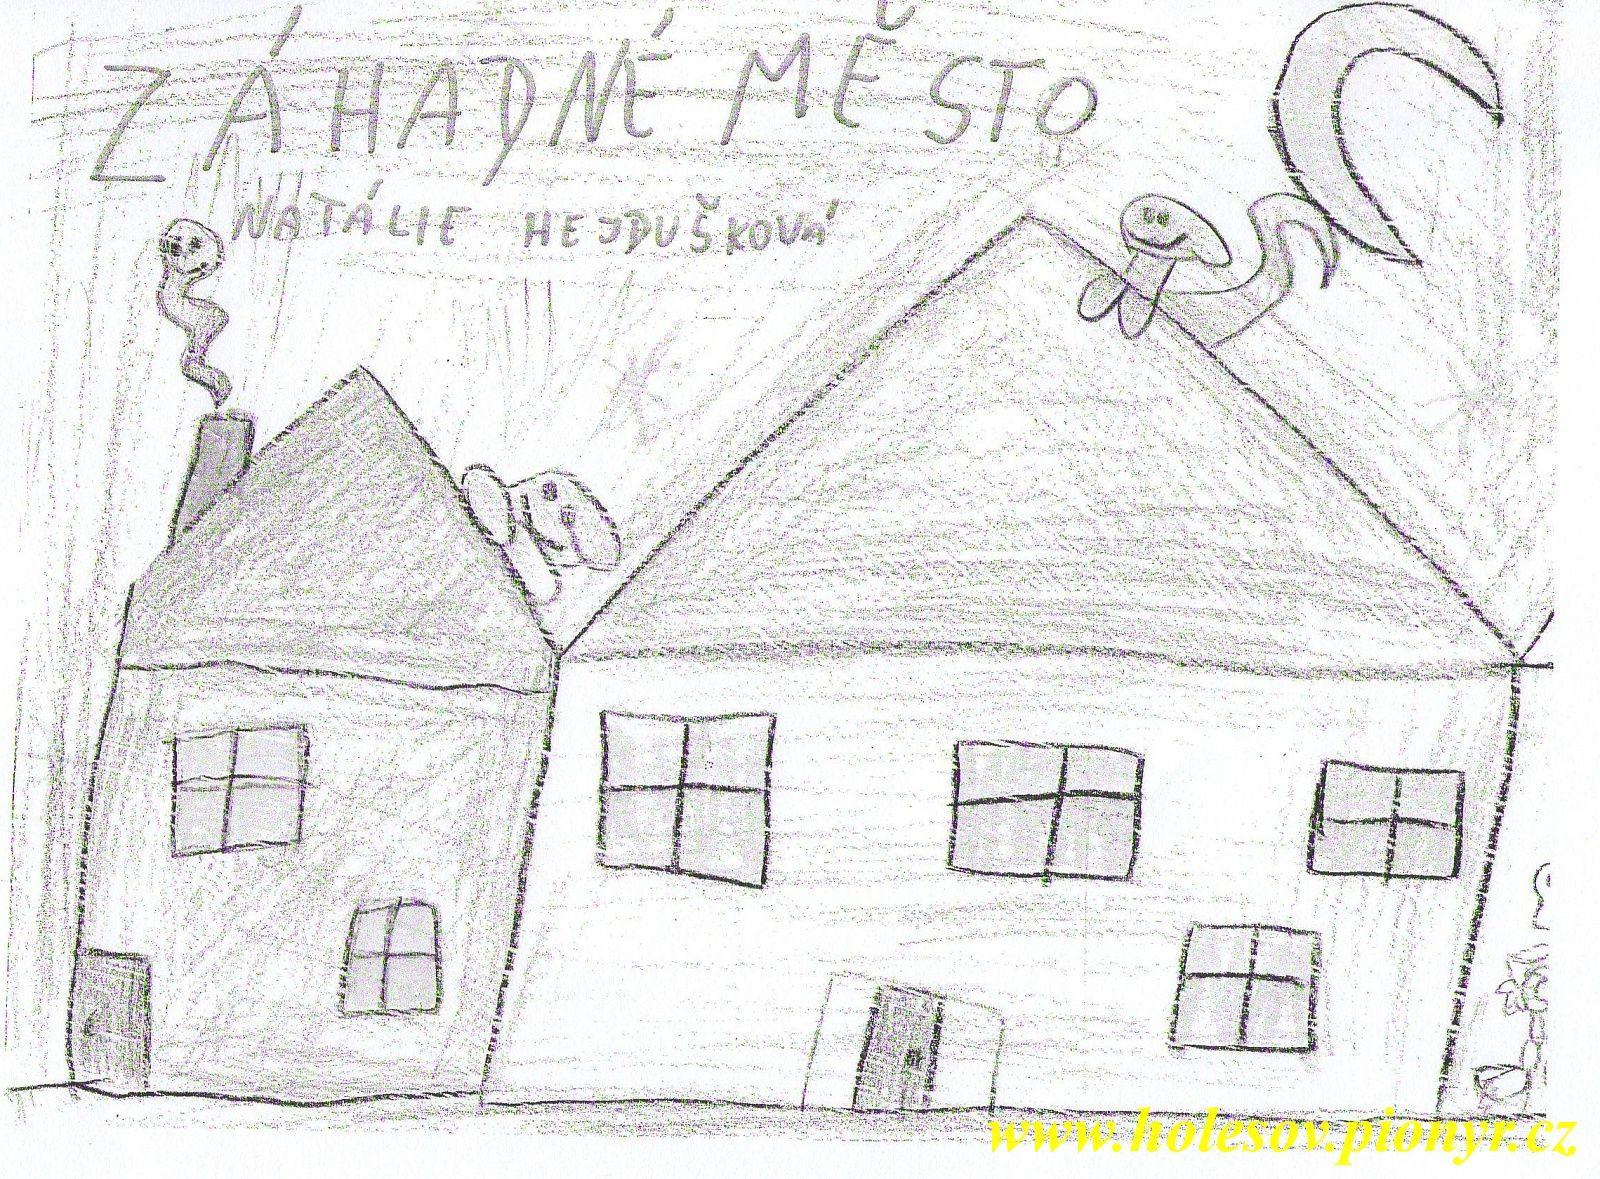 Hejduskova-Natalie-1-KATEGORIE-proza-1-misto_01